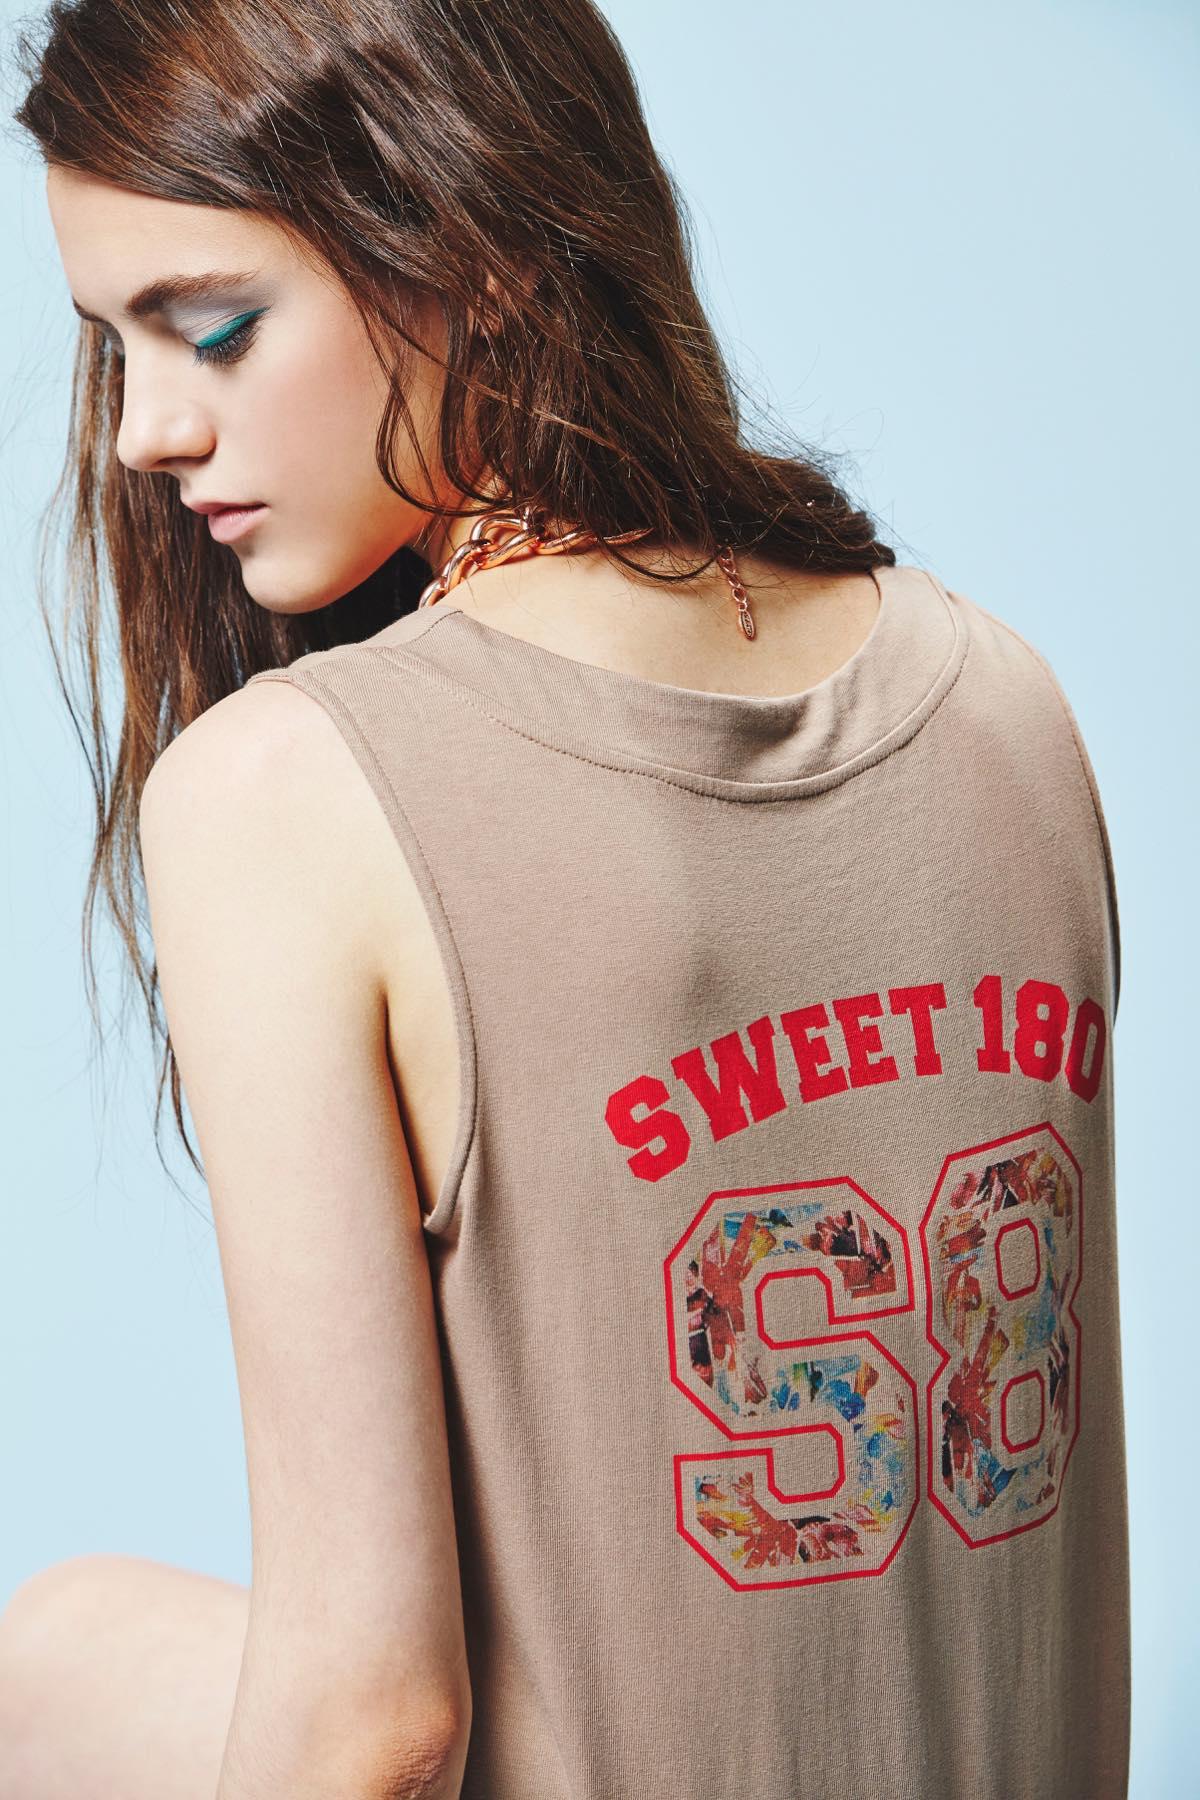 sweet180_2015_008